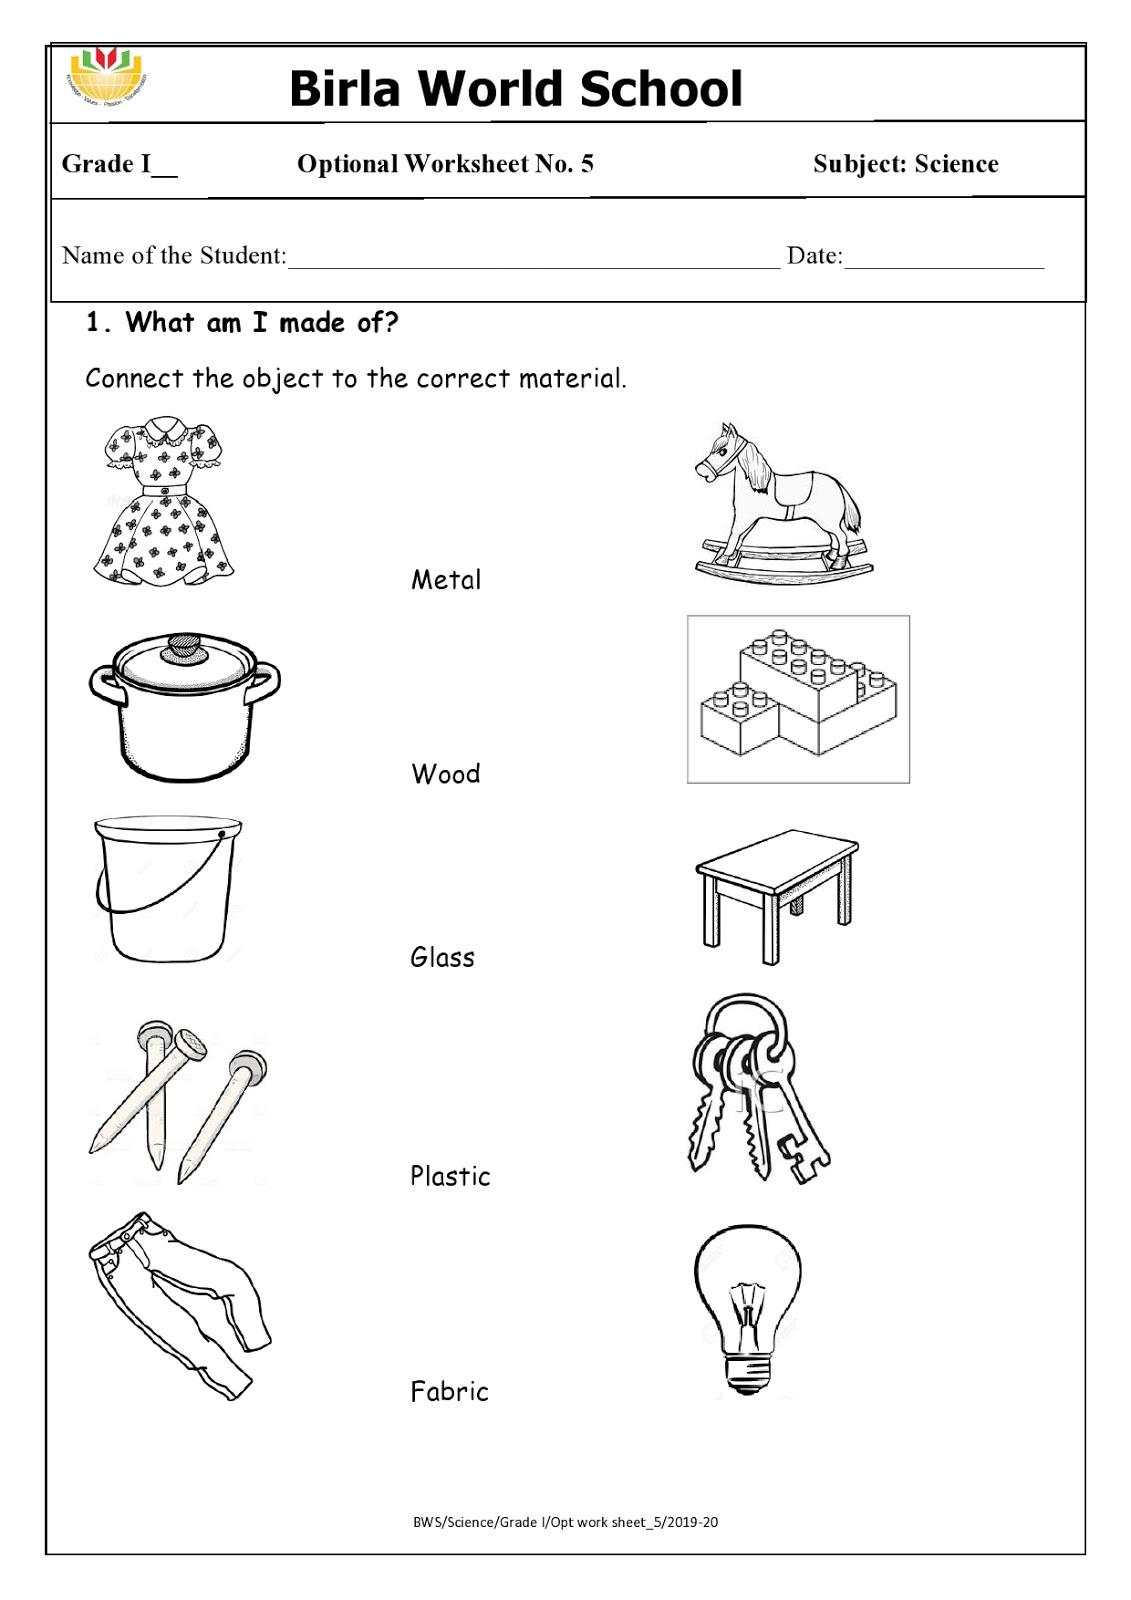 hight resolution of WORLD SCHOOL OMAN: Homework for Grade 1 as on 18-02-2020